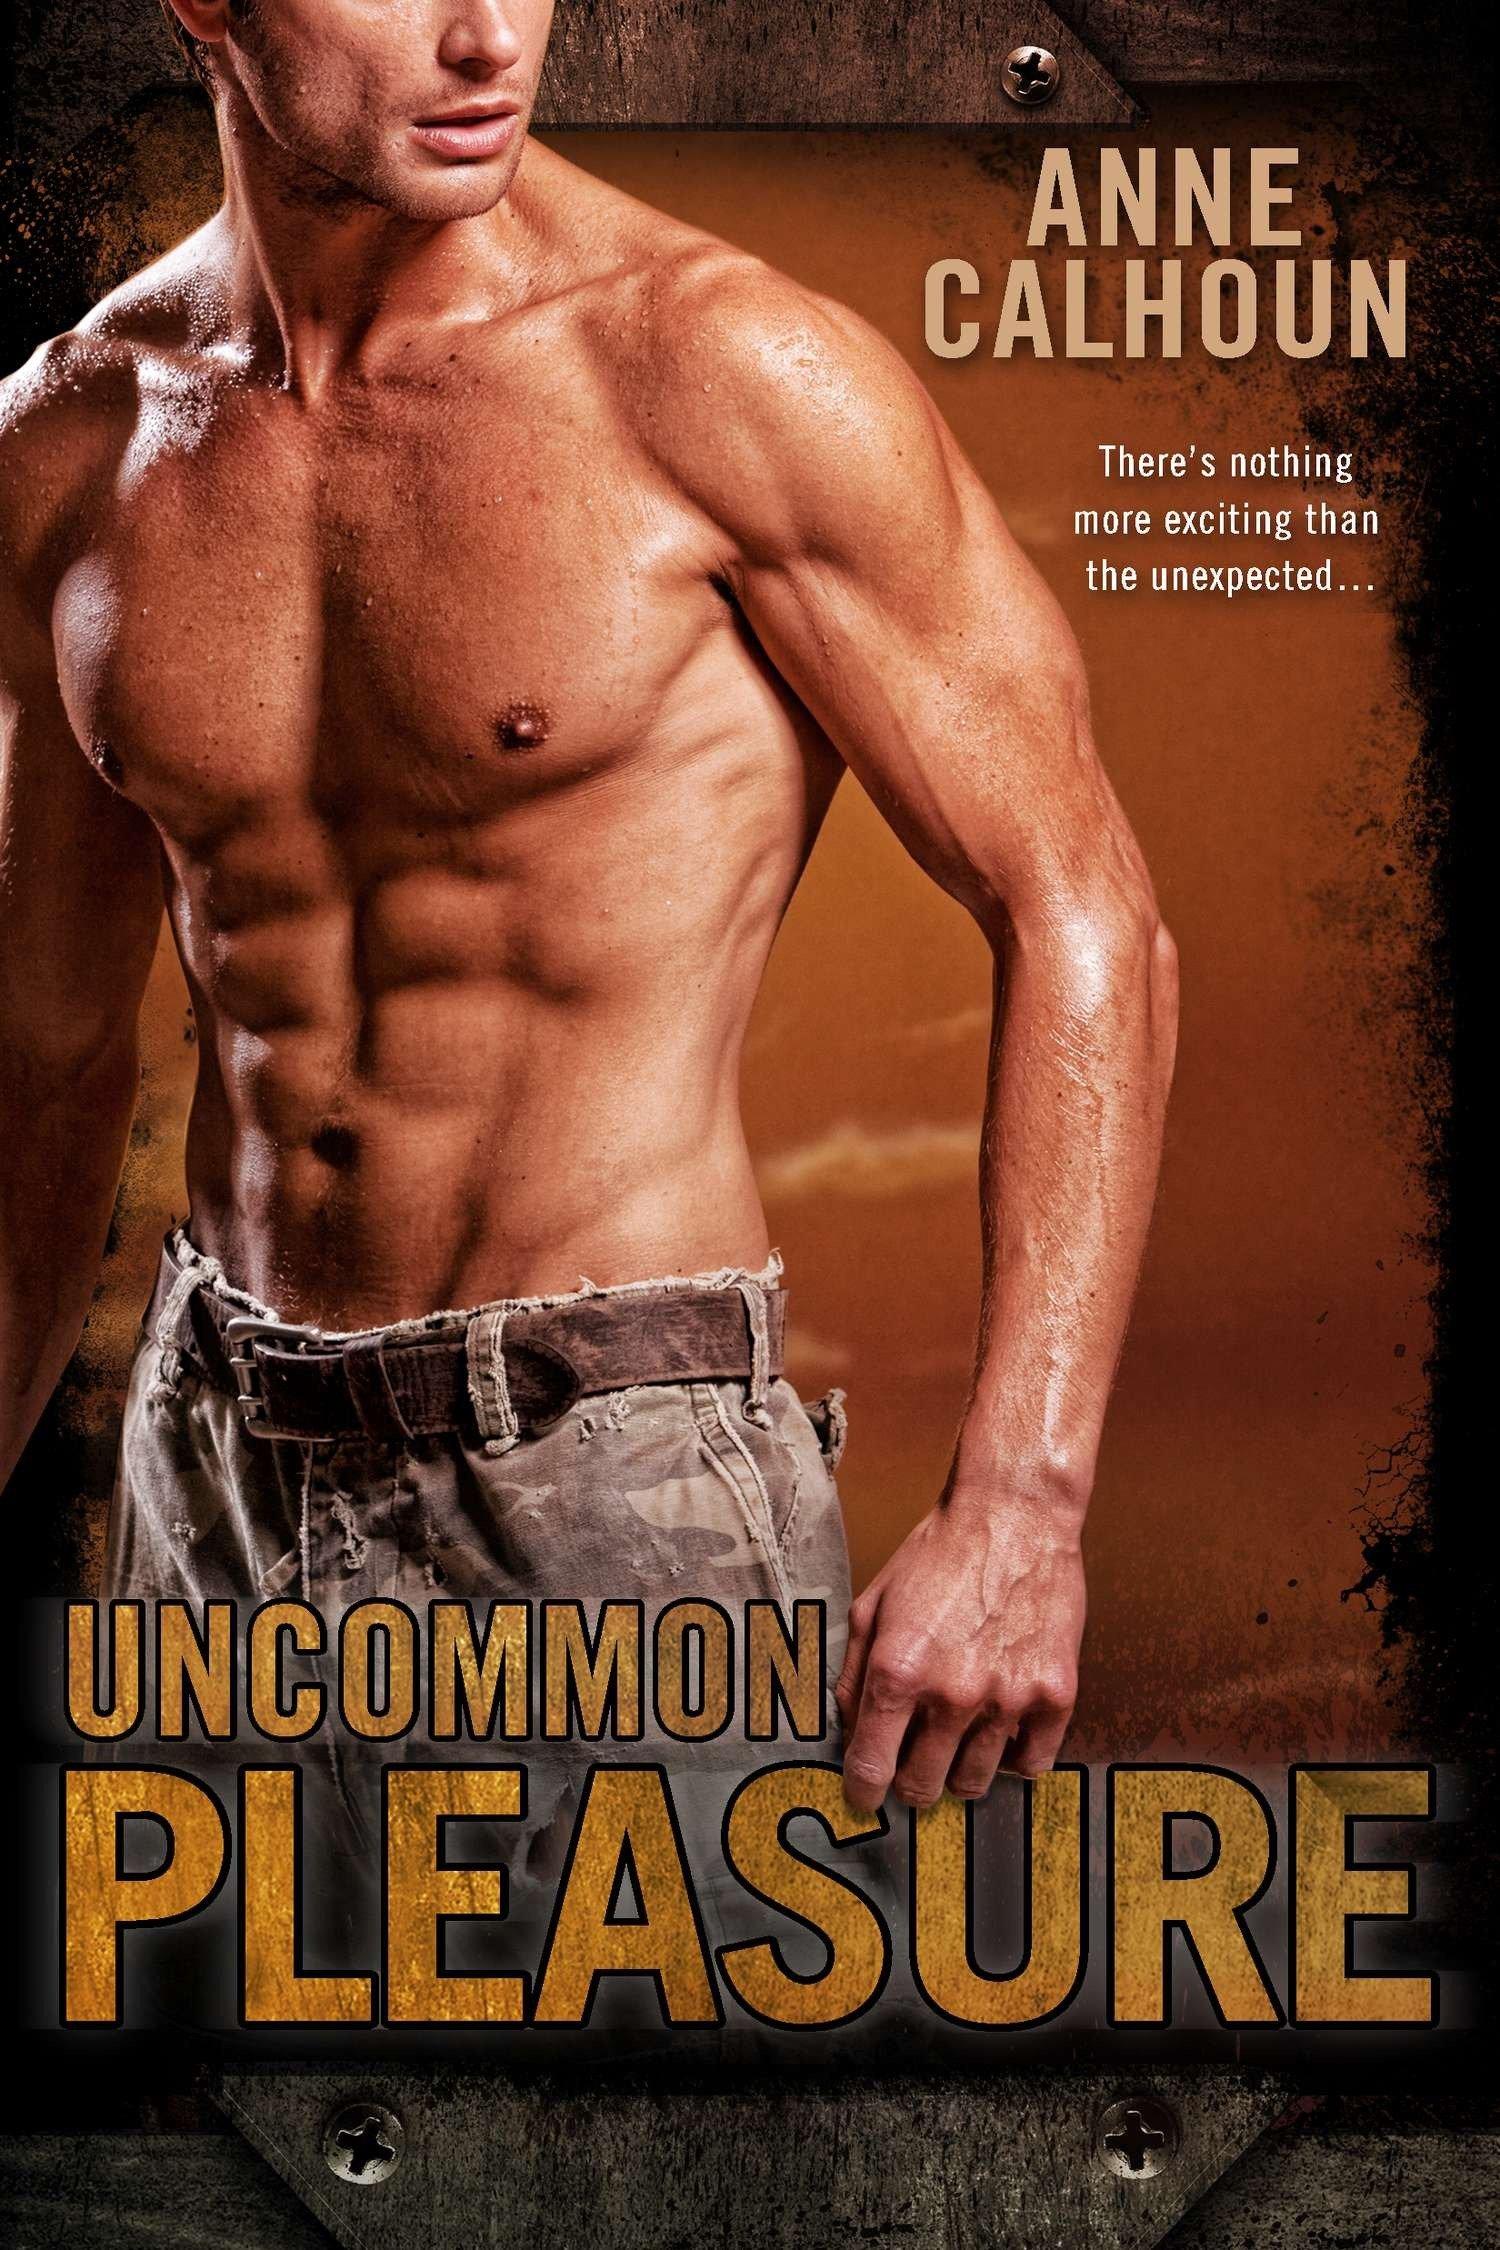 Uncommon Pleasure Anne Calhoun product image